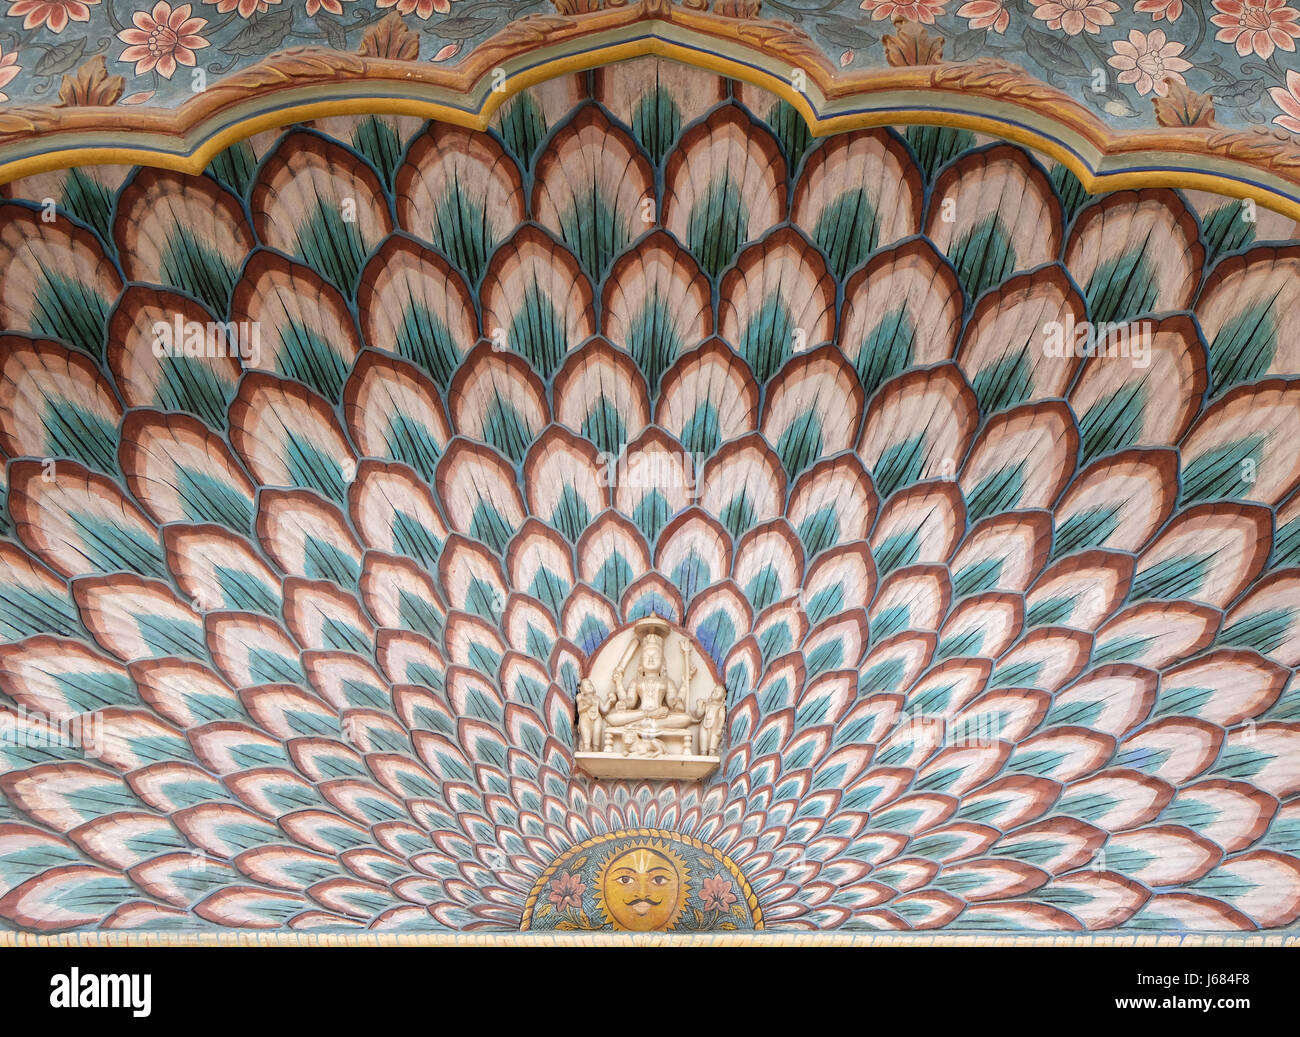 Lotus Gate at the Chandra Mahal, Jaipur City Palace in Jaipur, Rajasthan, India, on February, 16, 2016. - Stock Image